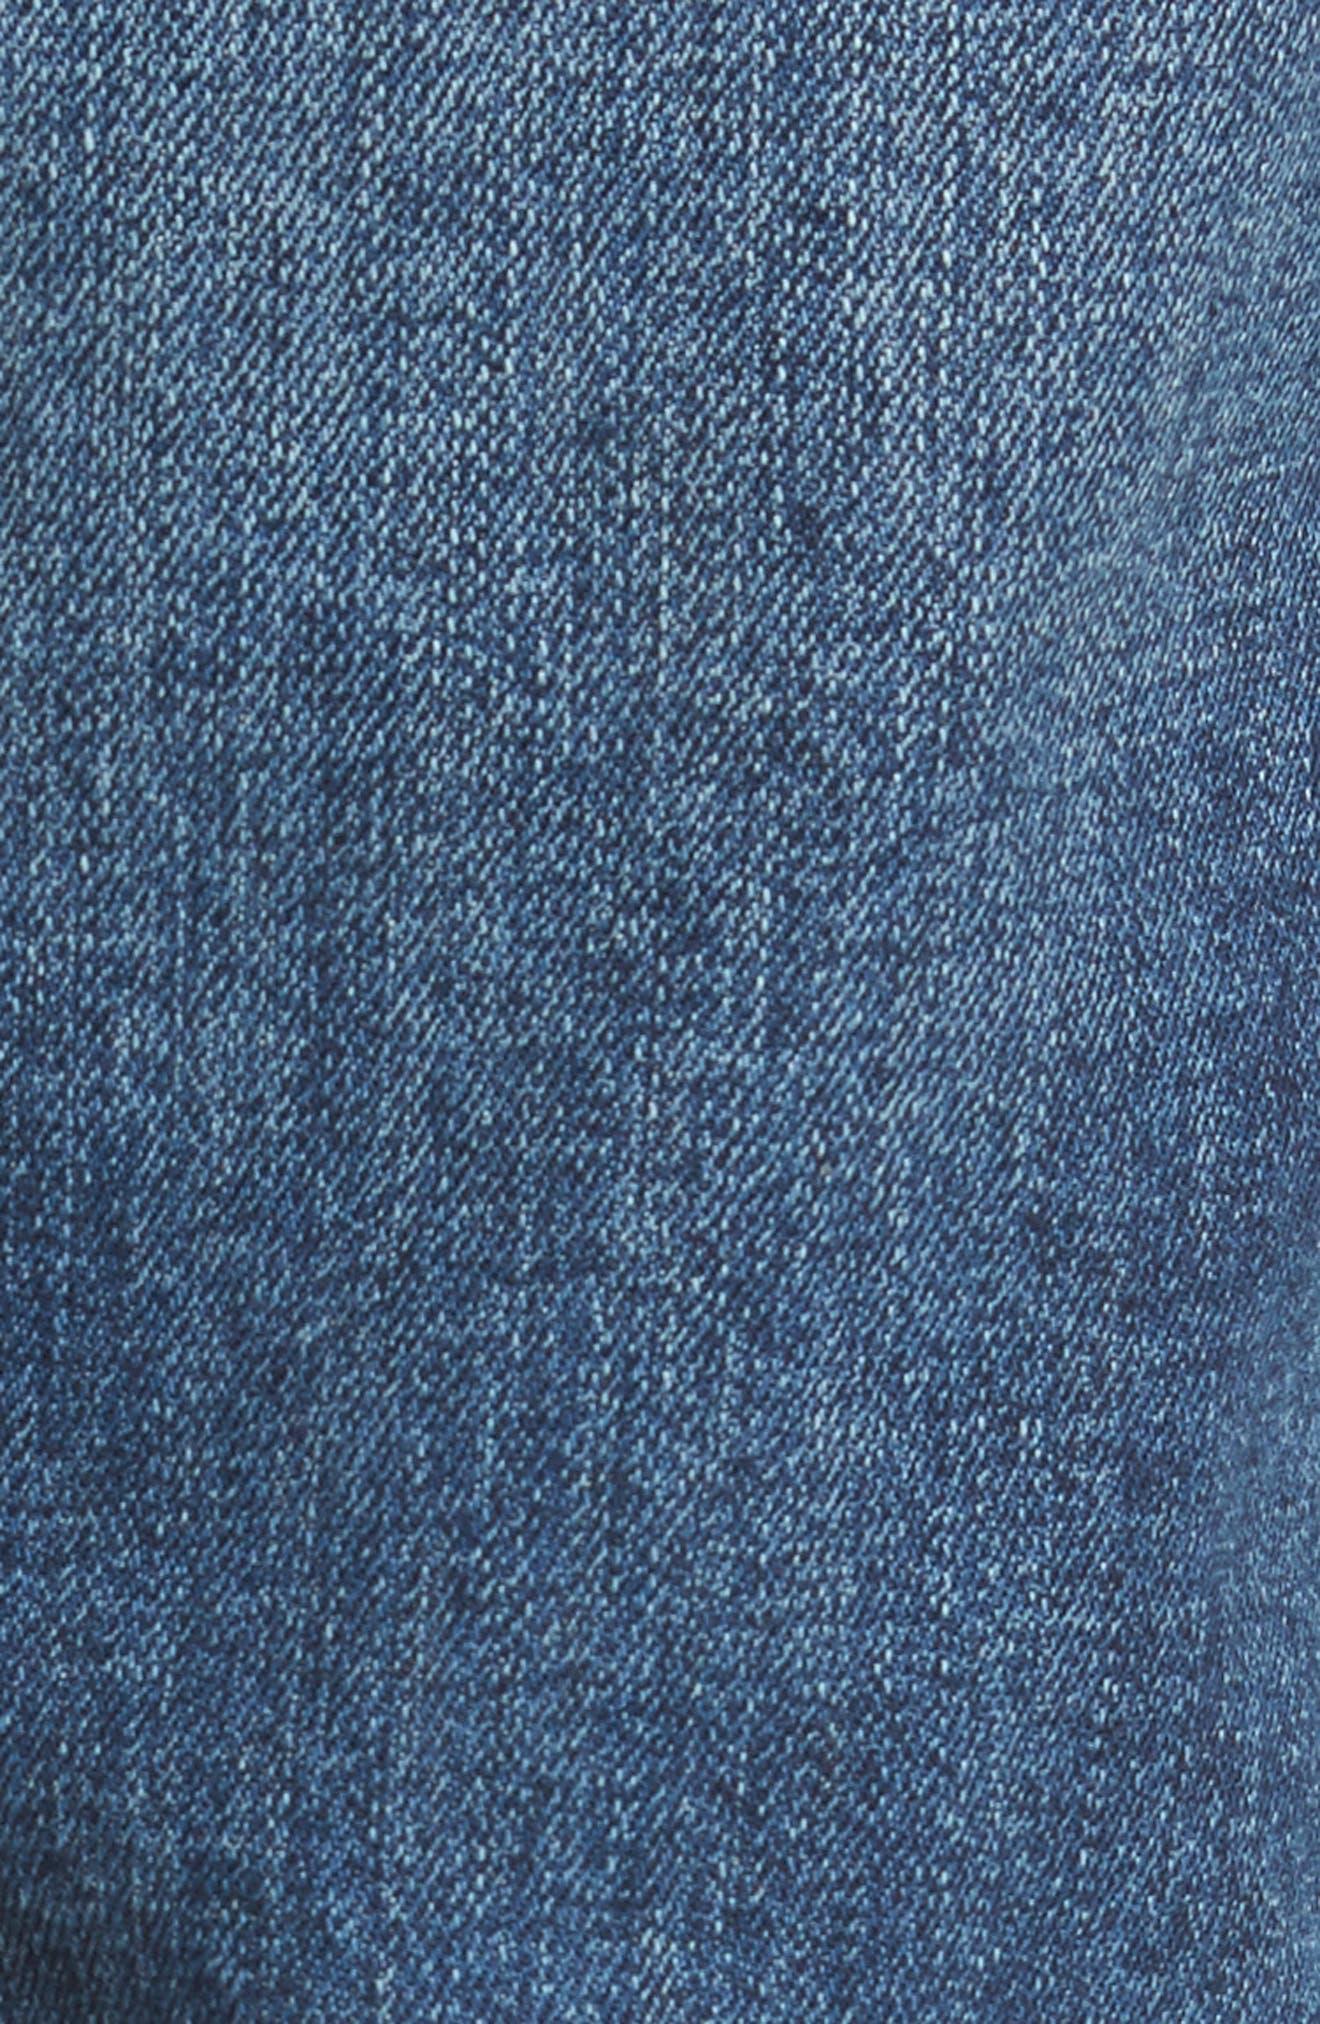 Skinny Fit Jeans,                             Alternate thumbnail 5, color,